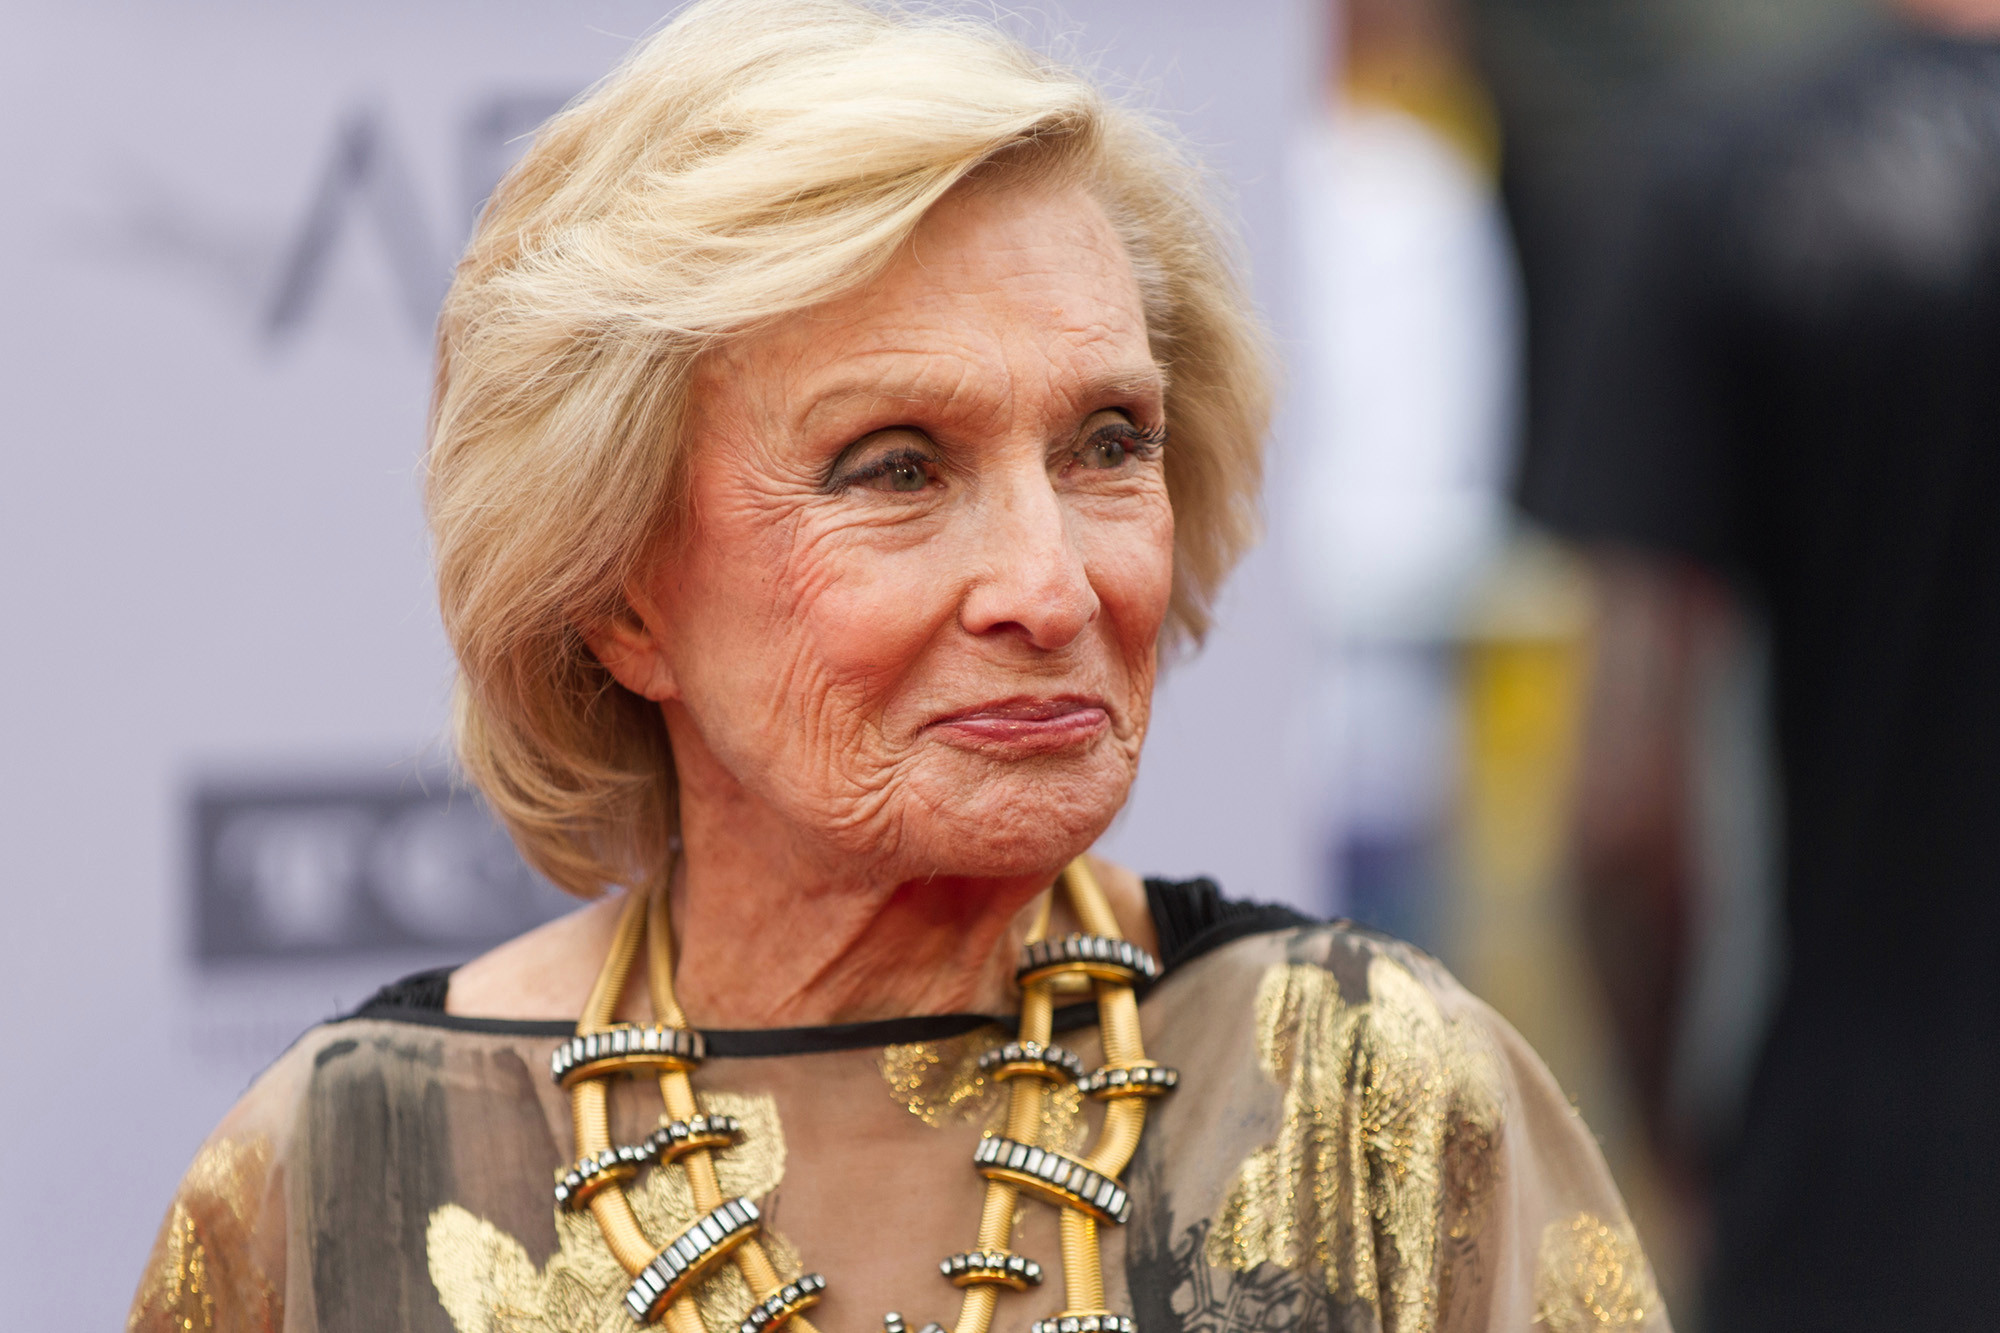 Cloris Leachmans cause of death was a stroke